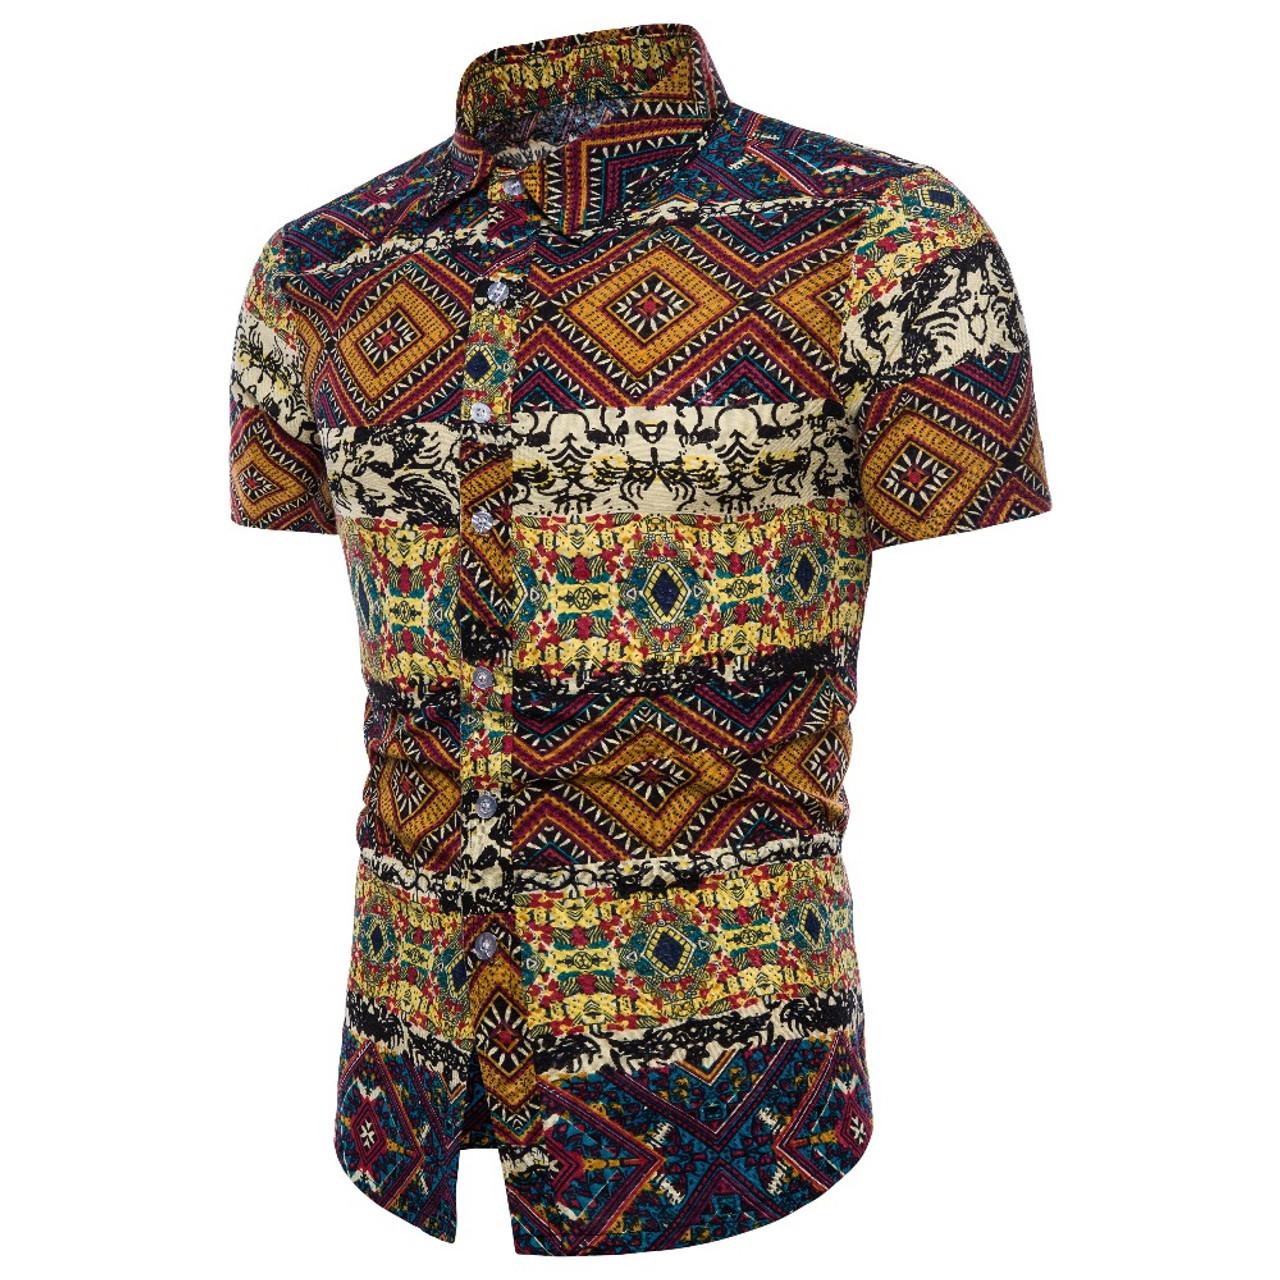 b78cbc4c ... 2018 Fashion Men's Short Sleeve Hawaiian Shirt Summer Casual Flower  Shirt Men's Asian Size M- ...